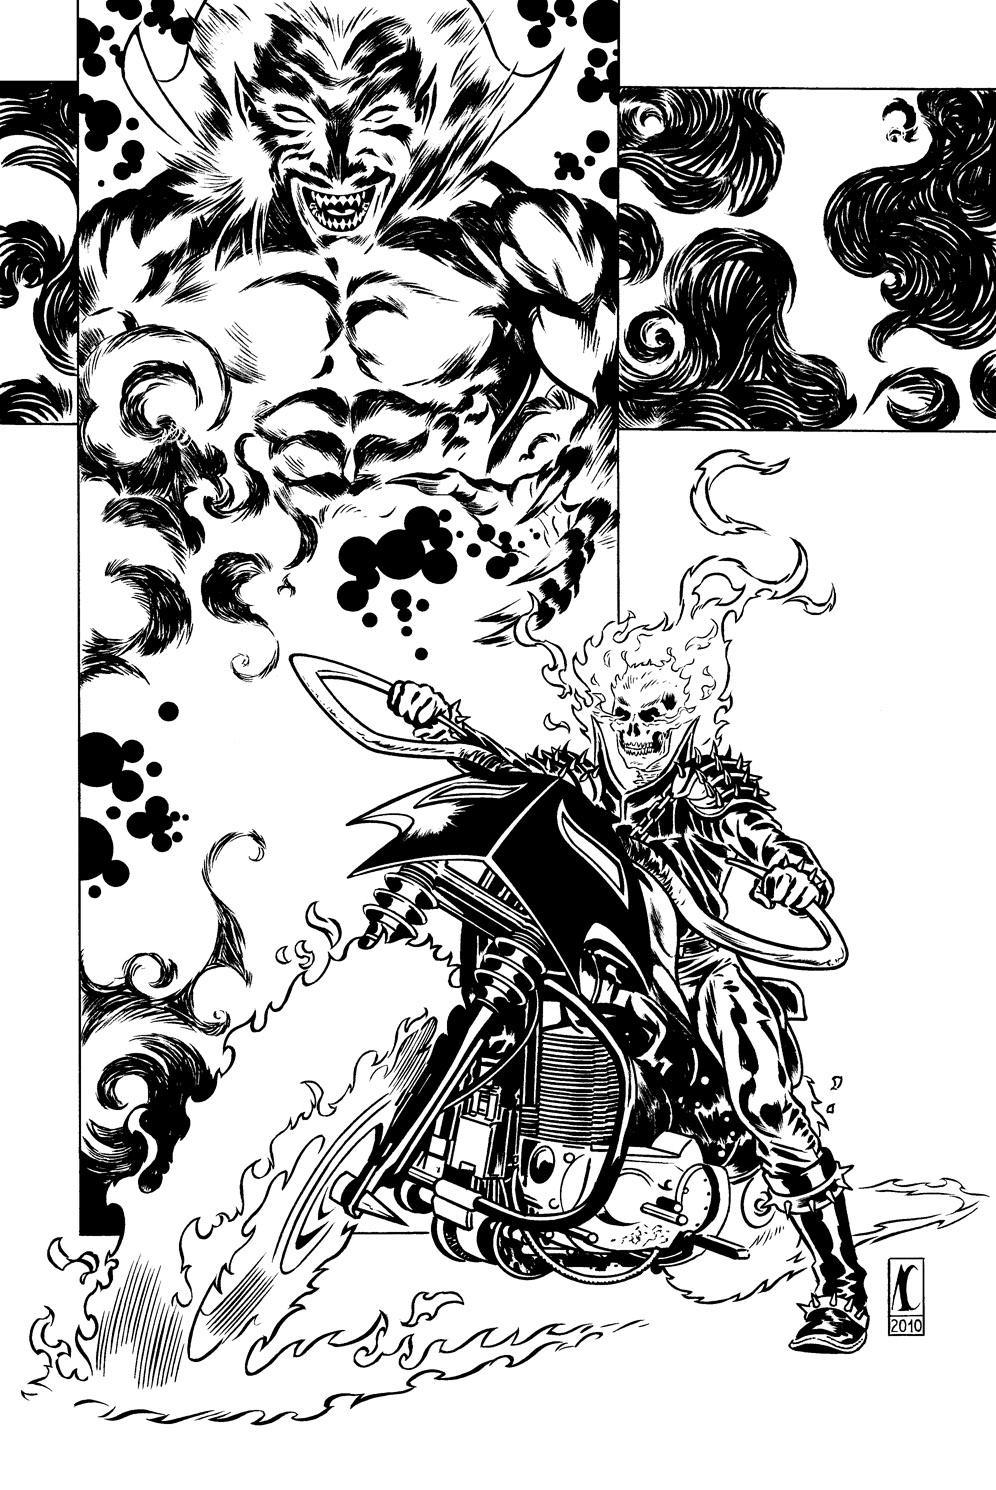 Coloriages imprimer ghost rider num ro 17649 - Coloriage ghost rider ...